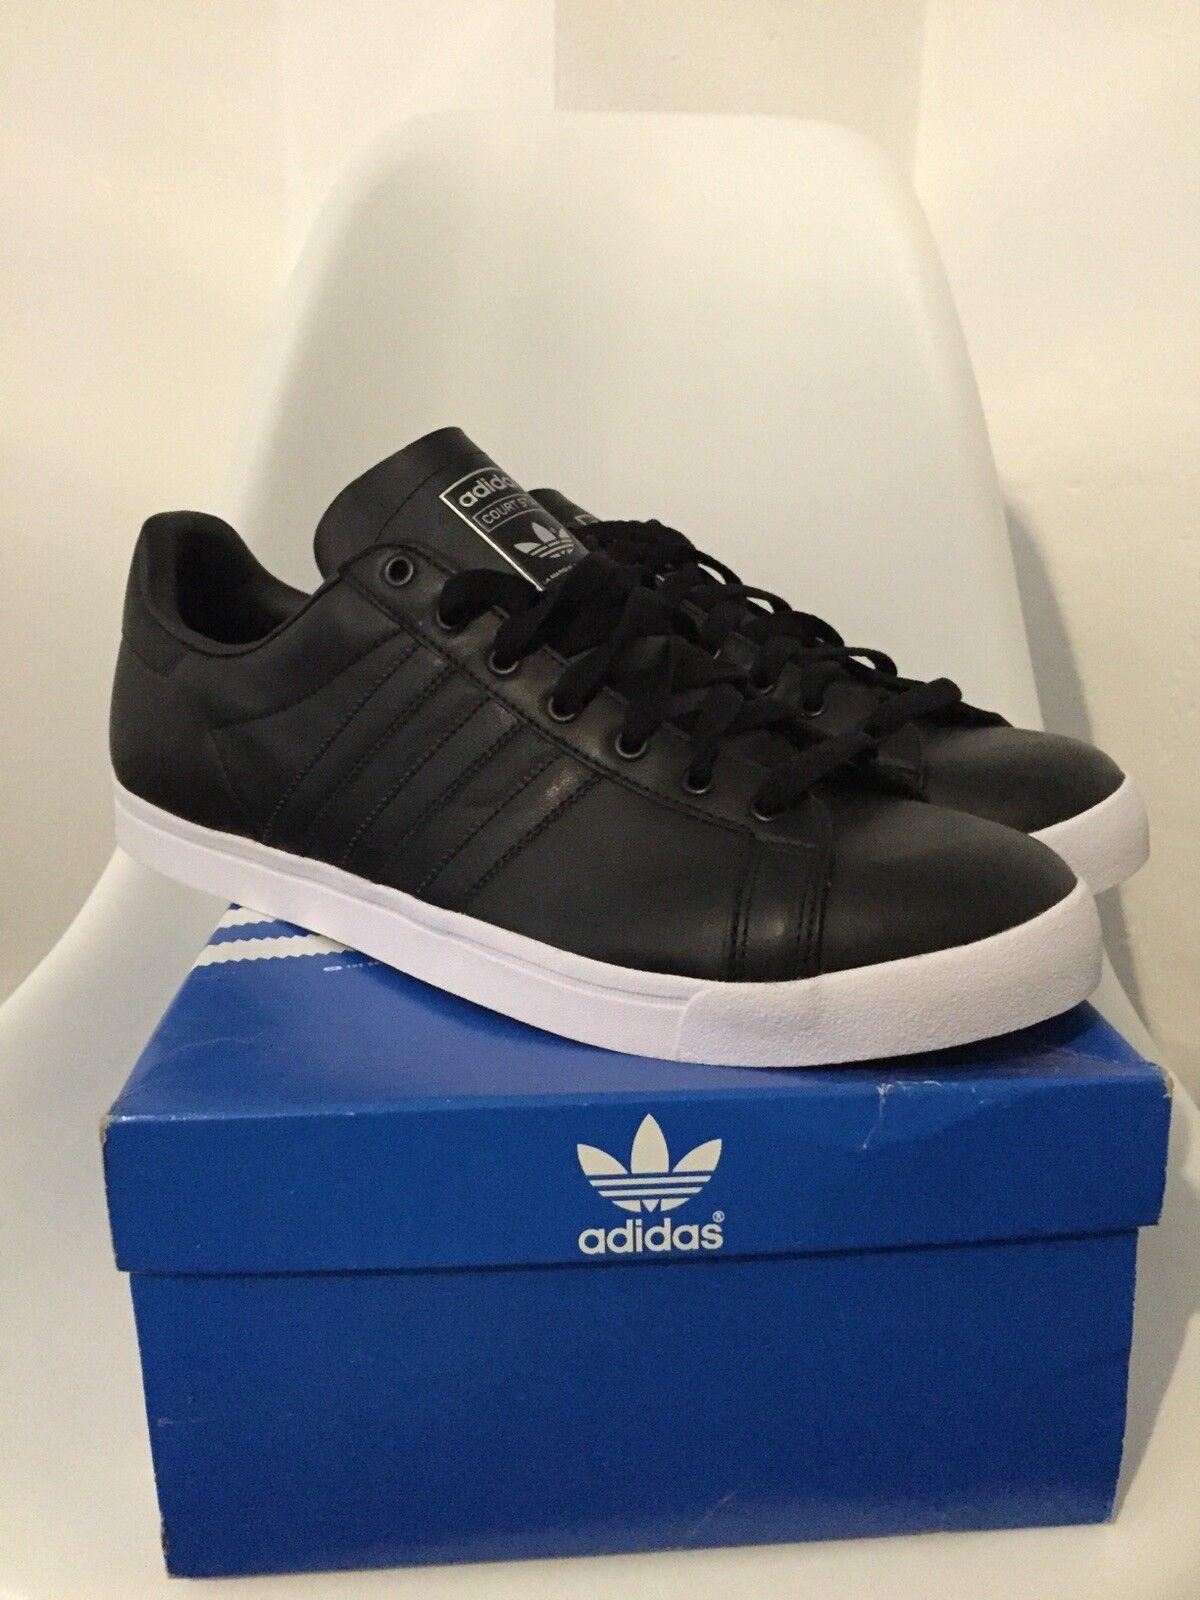 Adidas 1 Court Star, negro, 12 1 Adidas / 2 temporada de recortes de precios, beneficios de descuentos 403740